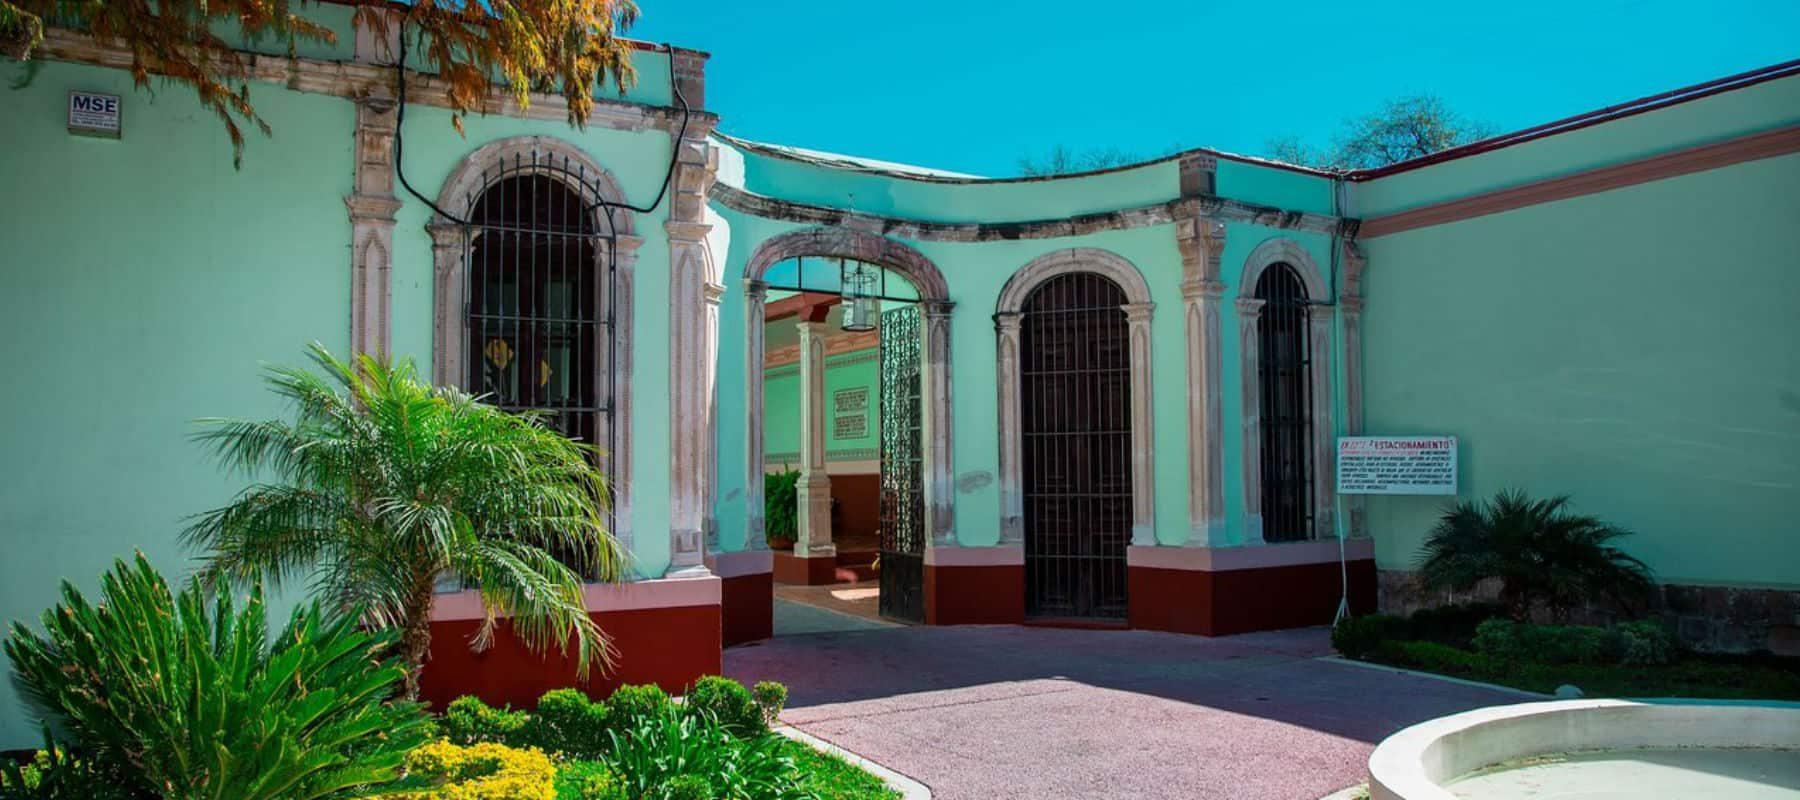 Baños Termales De Ojocaliente En Aguascalientes